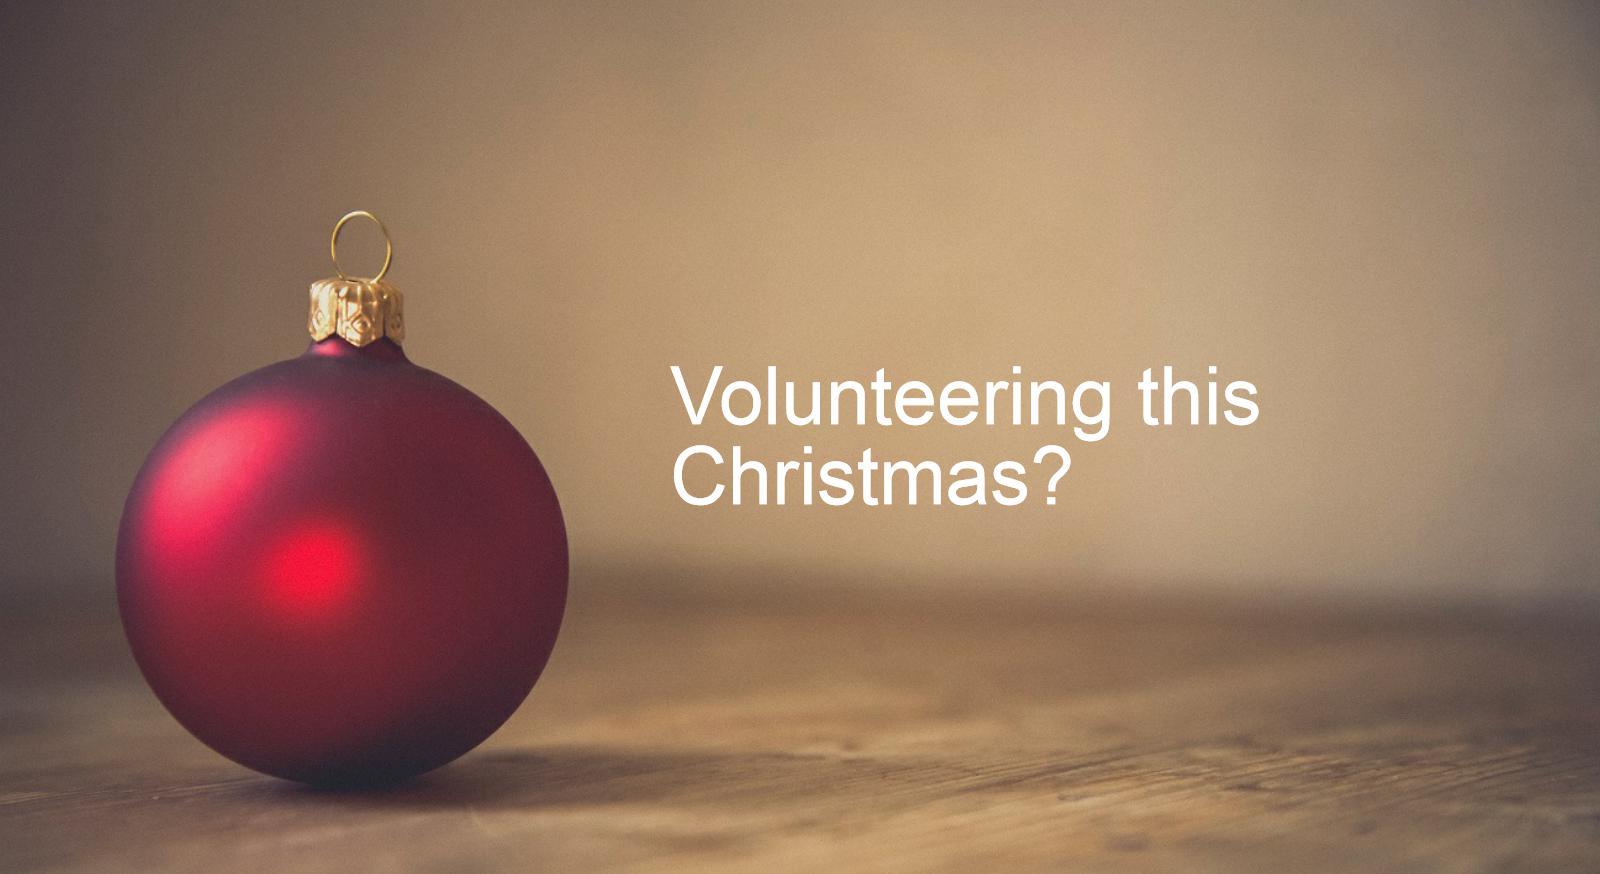 Volunteering over Christmas